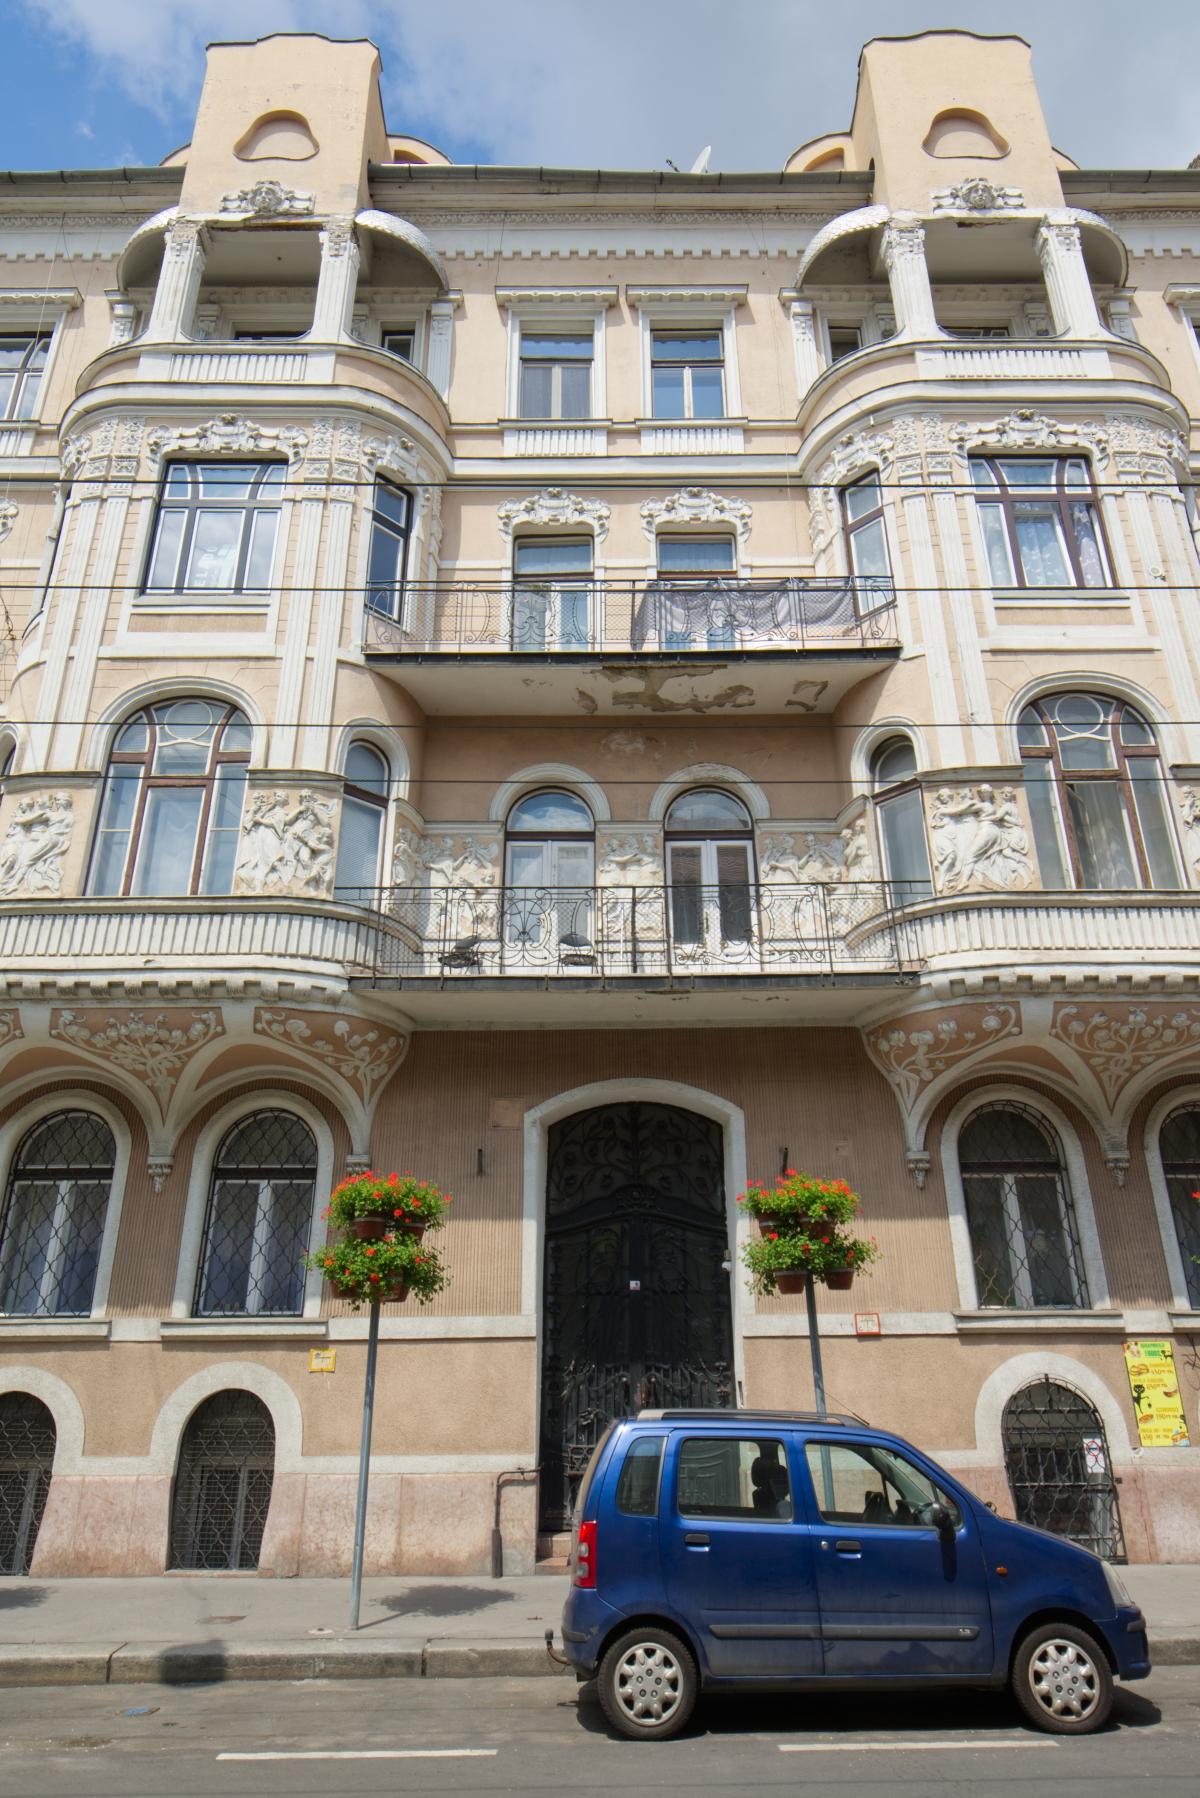 District 7, István utca 18